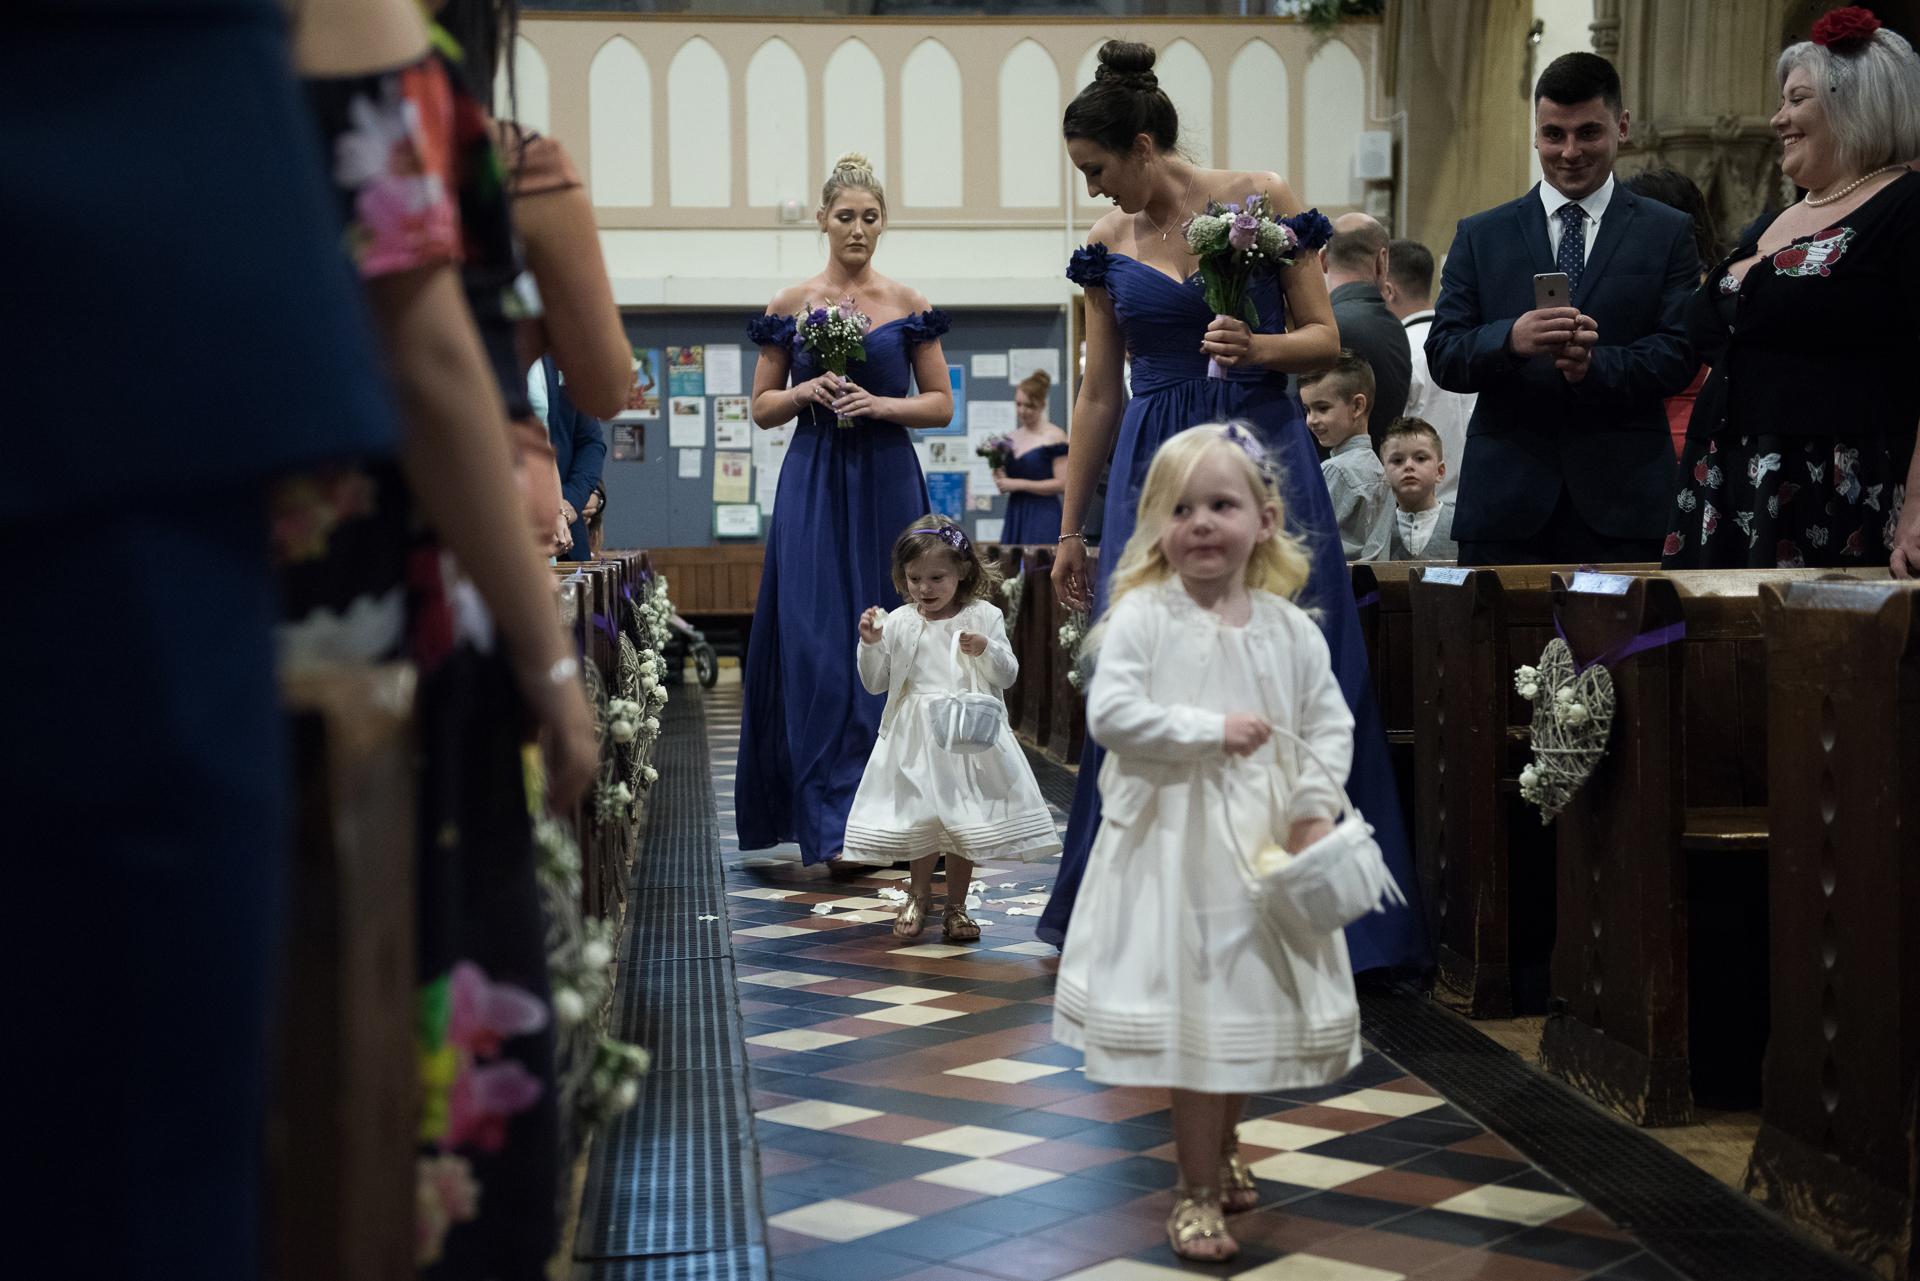 Ufton Court Wedding Photography05.JPG